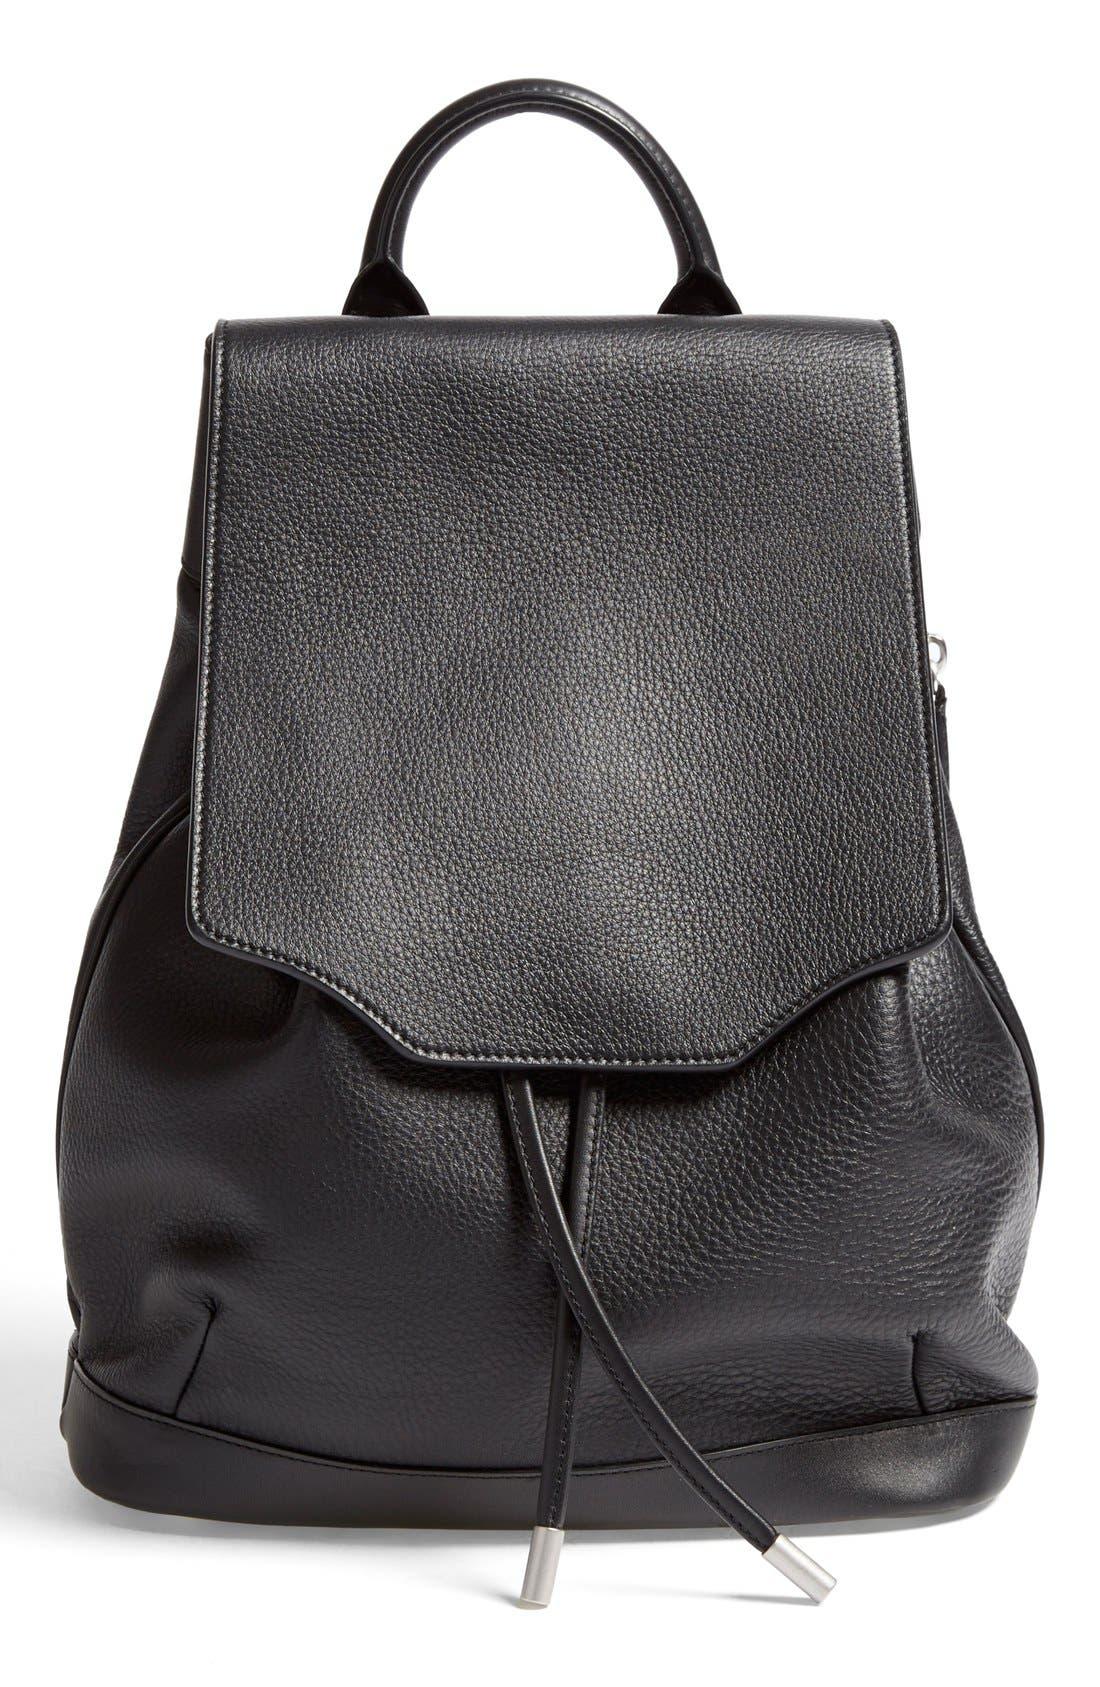 RAG & BONE,                             'Pilot' Leather Backpack,                             Main thumbnail 1, color,                             001